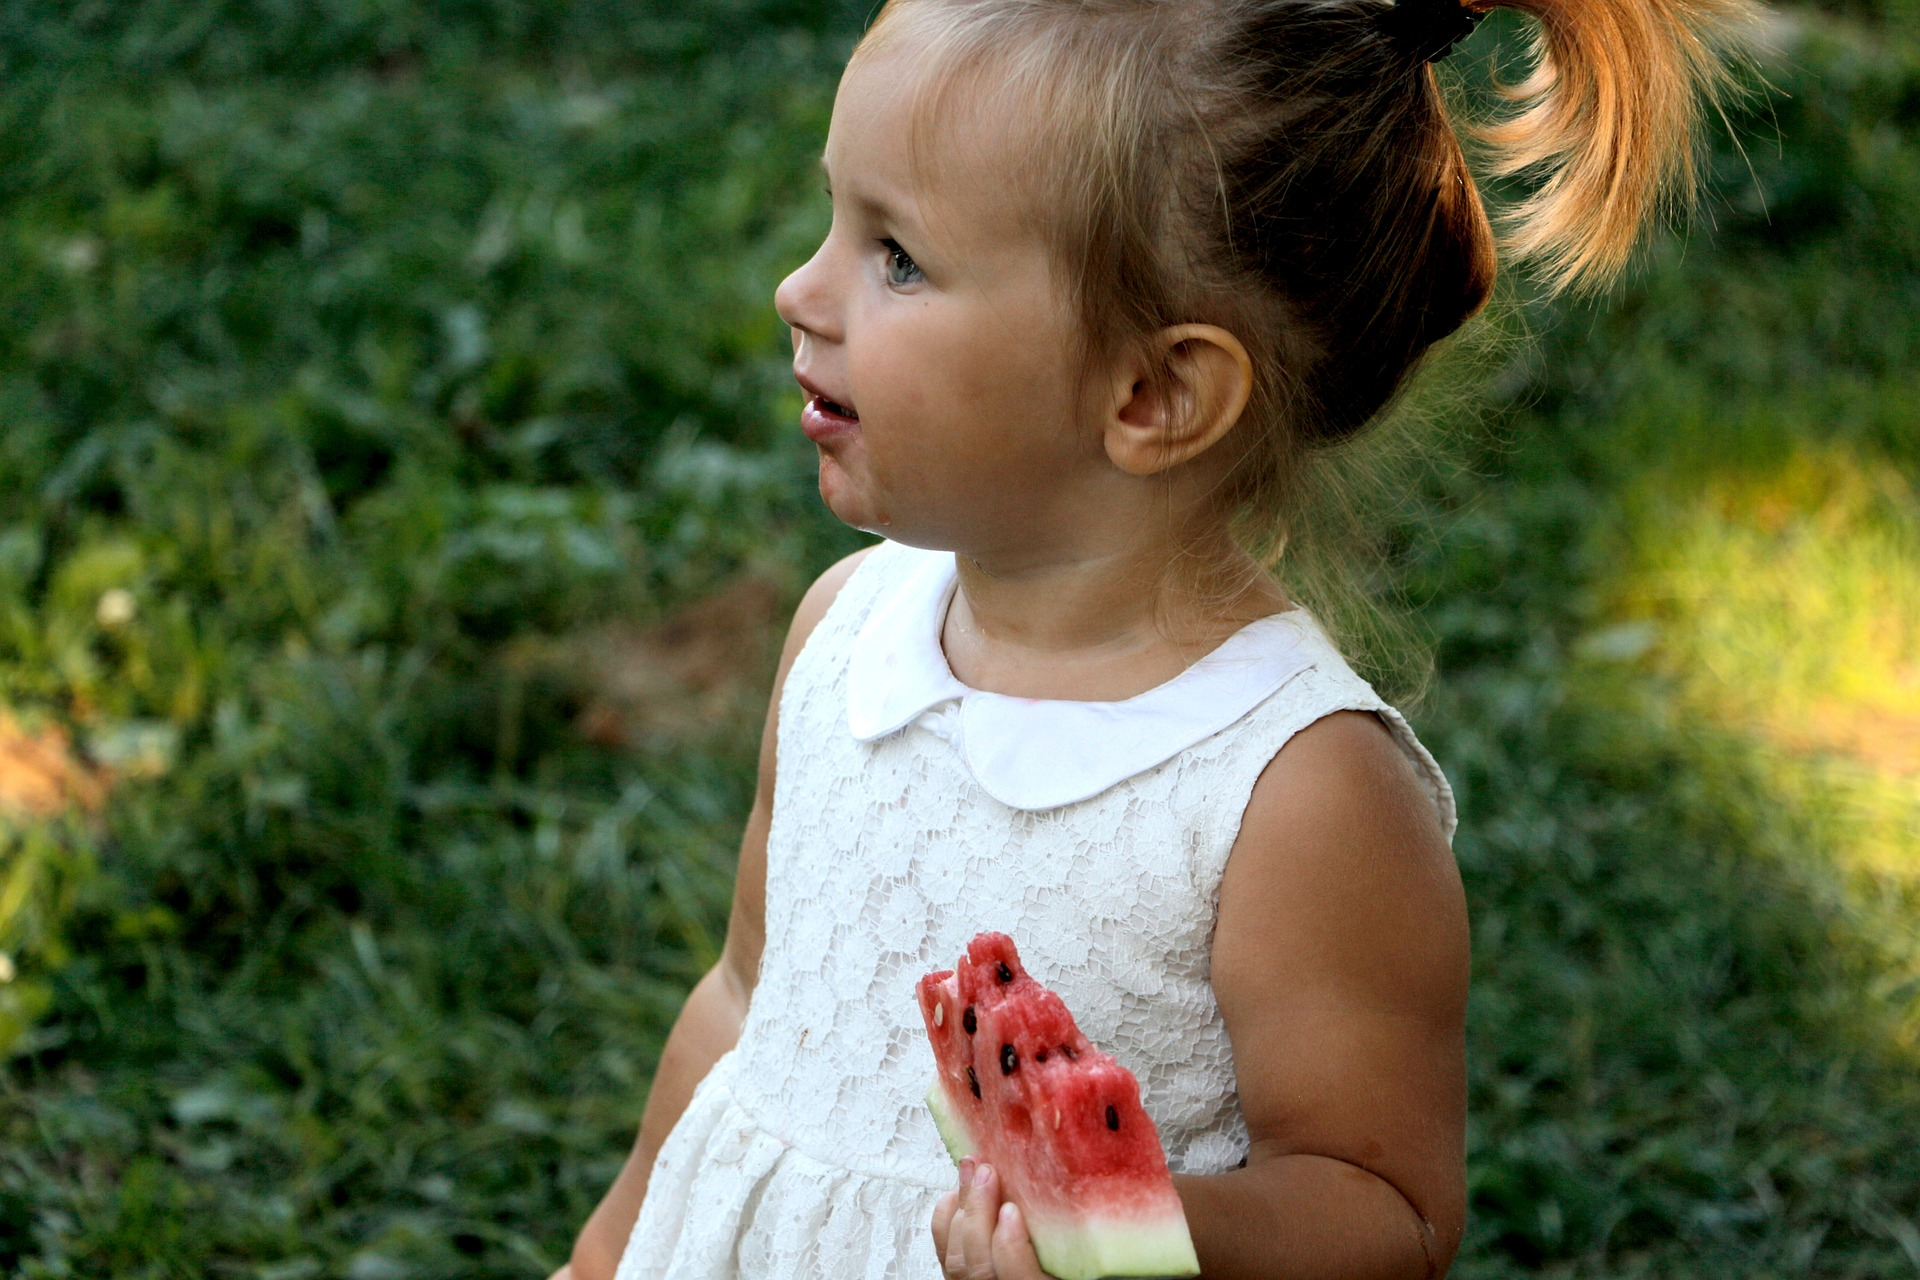 Little Girl Eating a Watermelon | Kids Car Donations